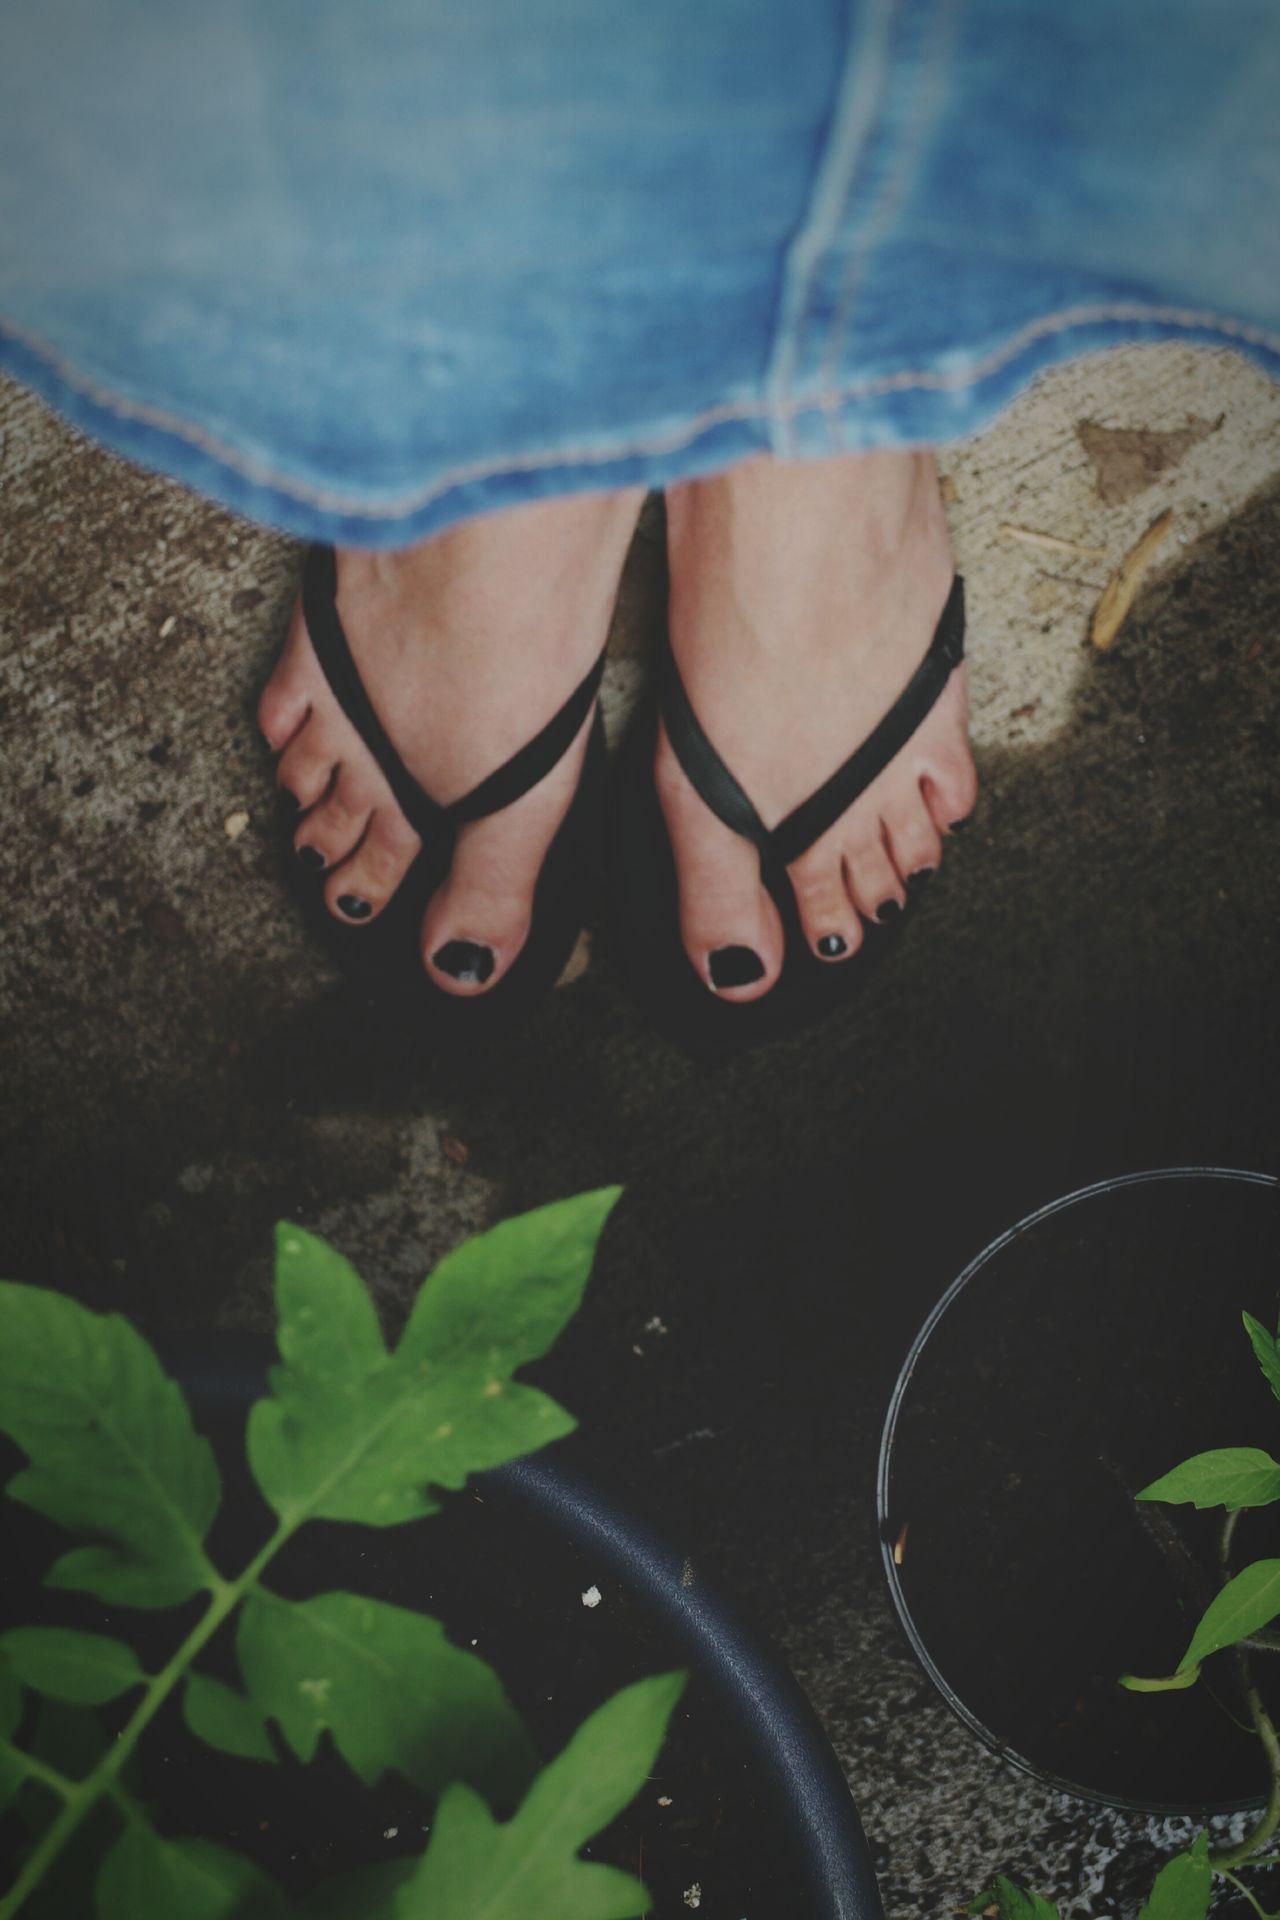 Gardening Container Gardening Tomatoes Feet Selfie